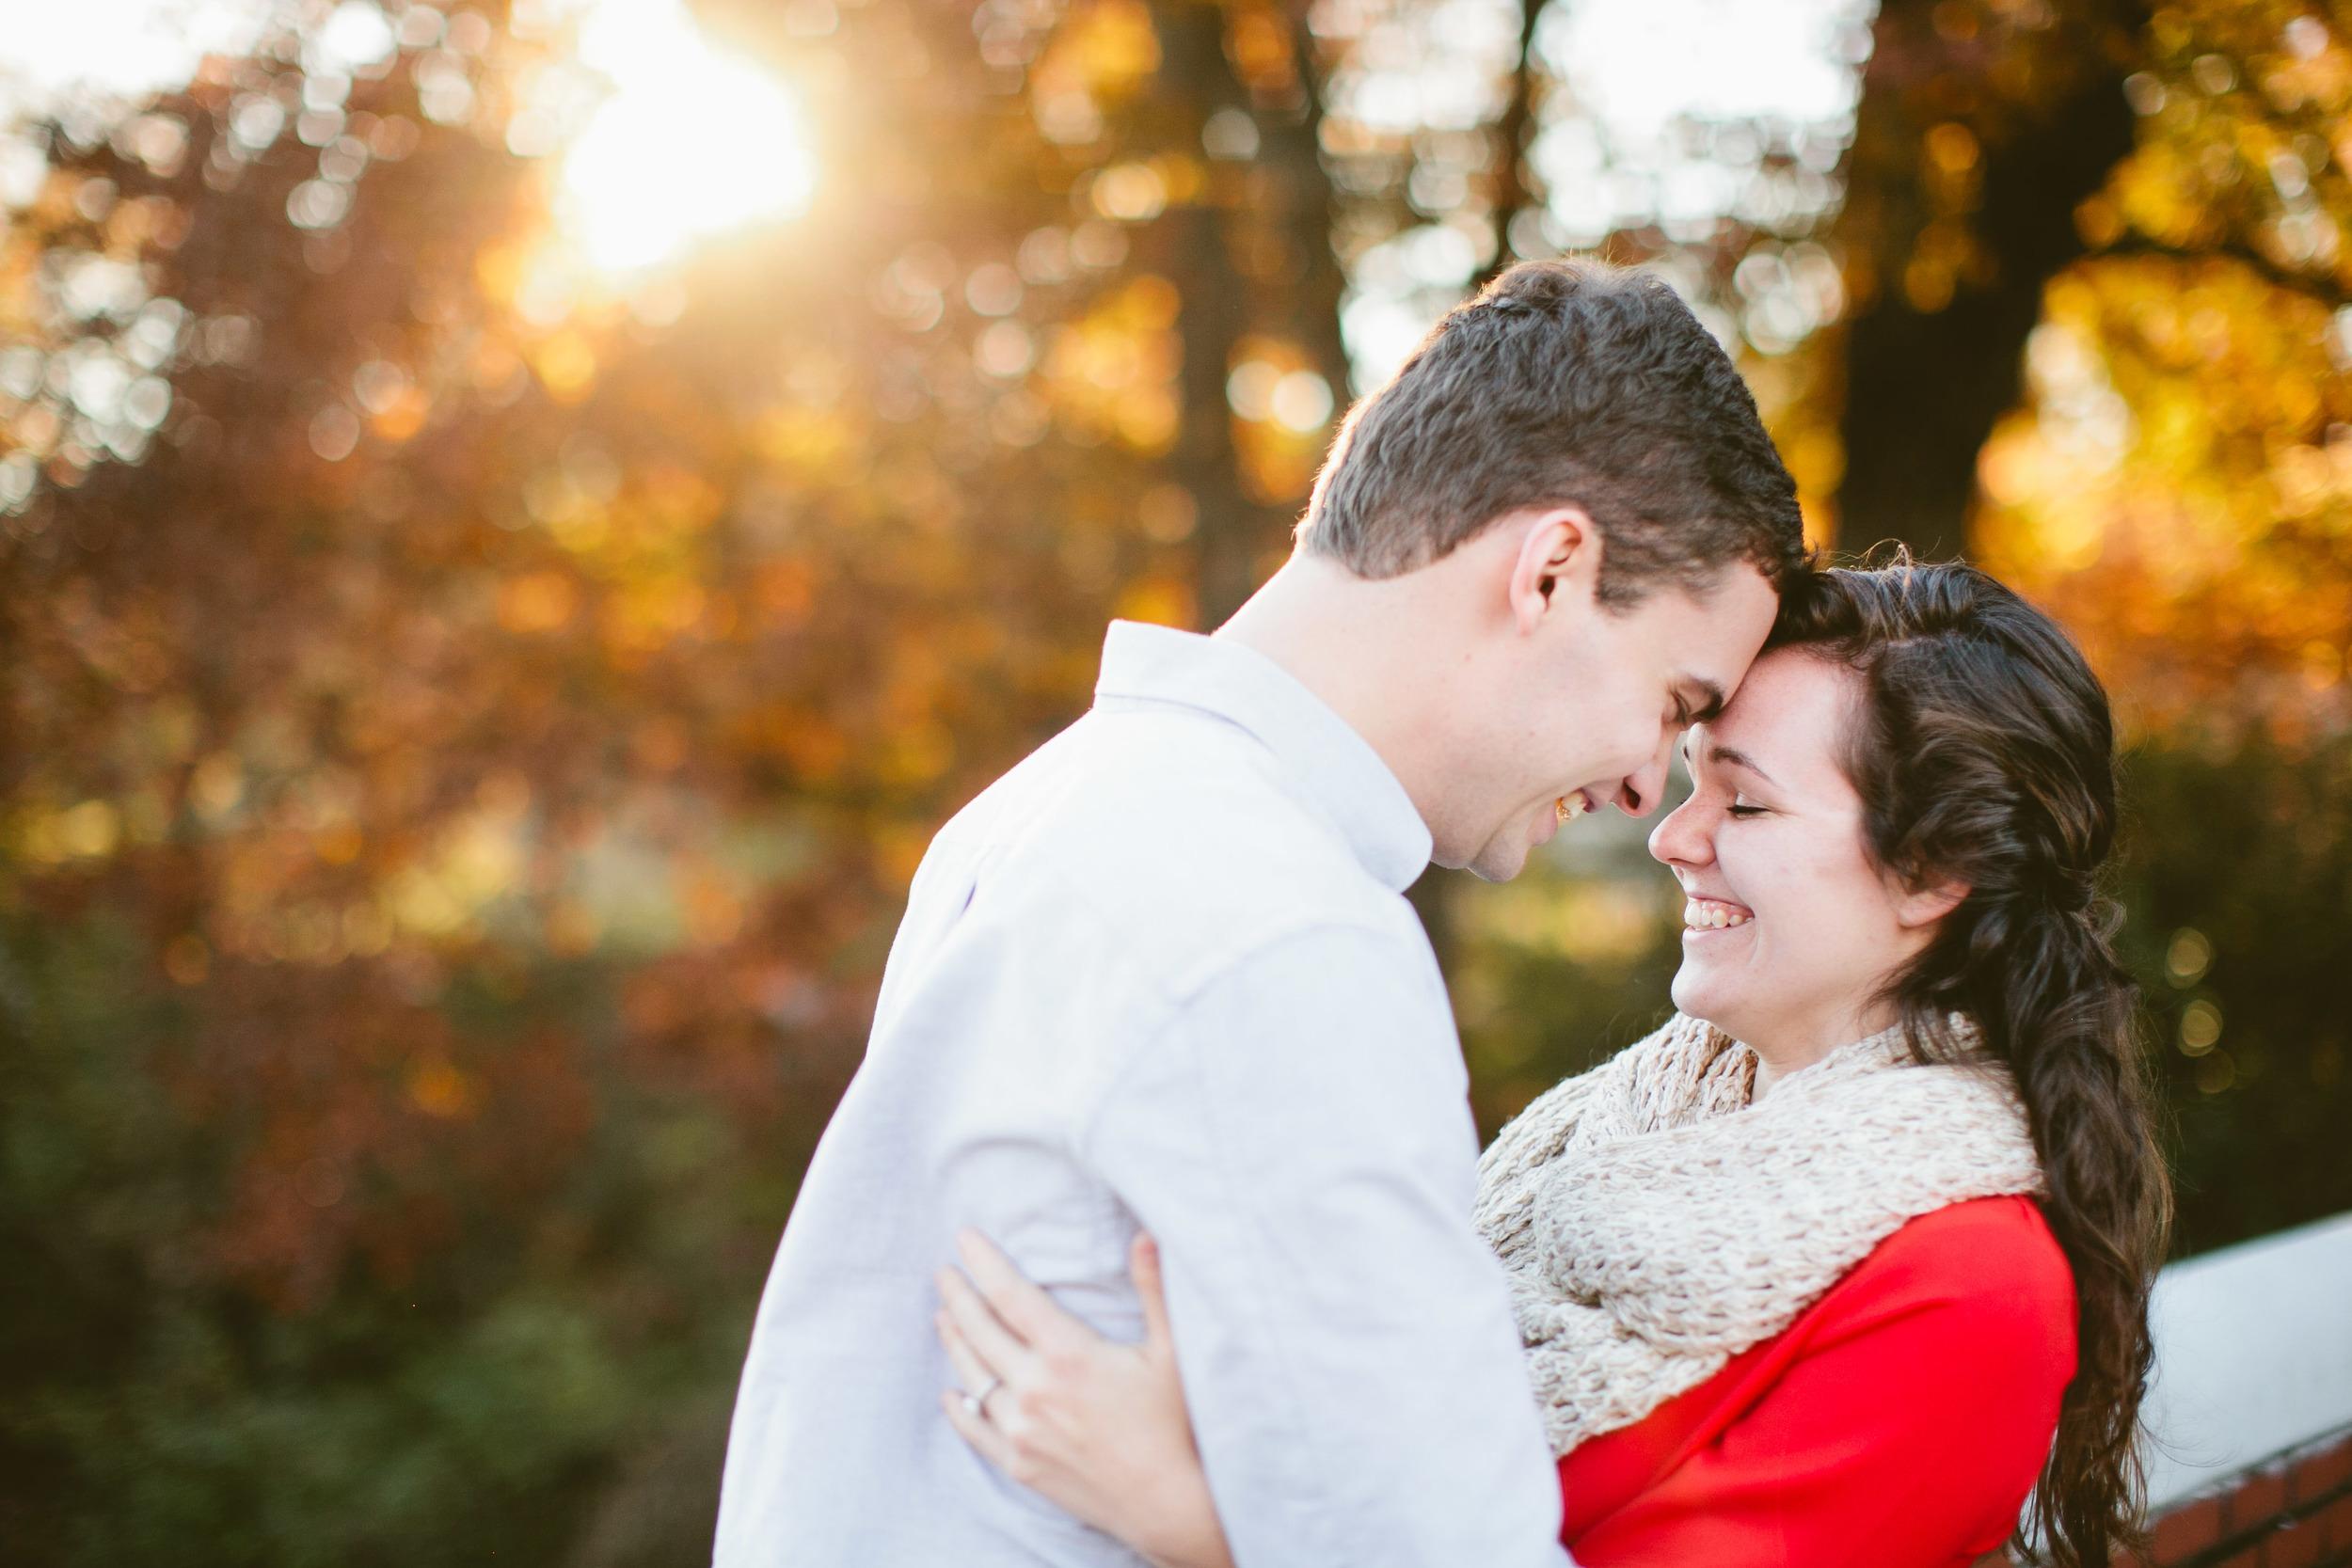 Atlanta-Engagement-Photographer-Kathryn-McCrary-Photography-Piedmont-Park-Virginia-Highlands-Fall-Engagement-Shoot-17.jpg